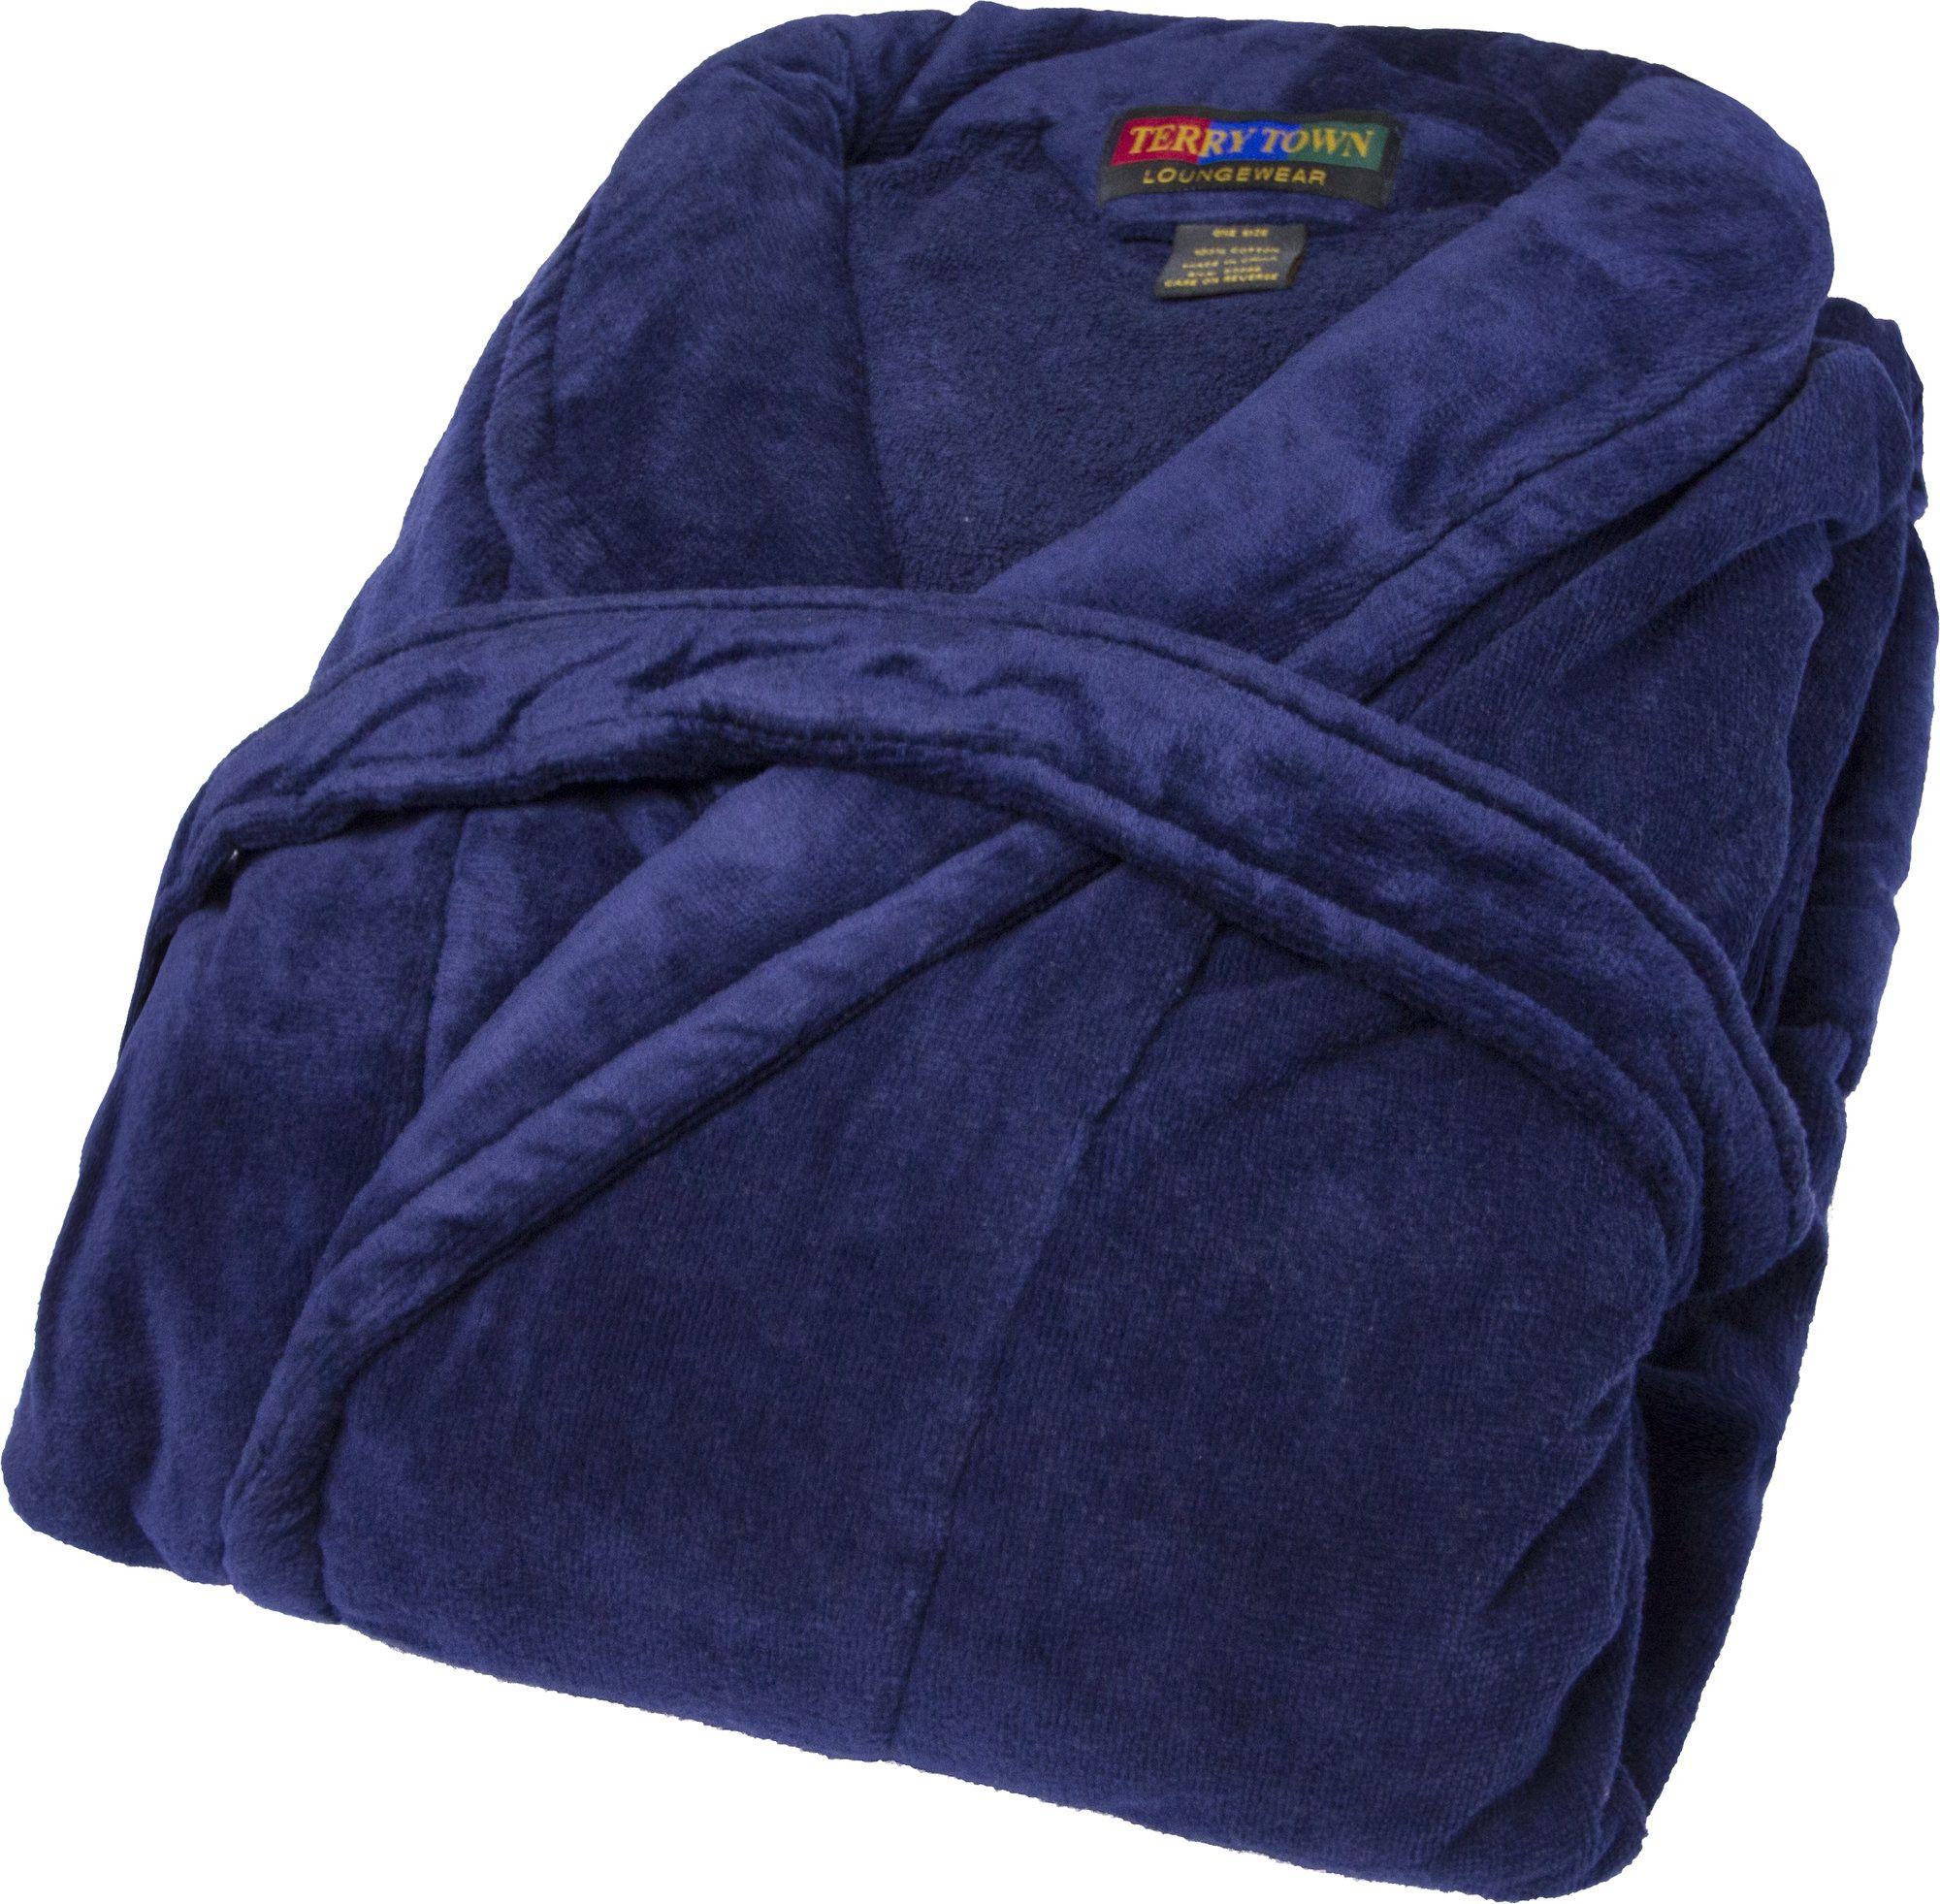 Terry velour shawl bathrobe terry town pinterest products